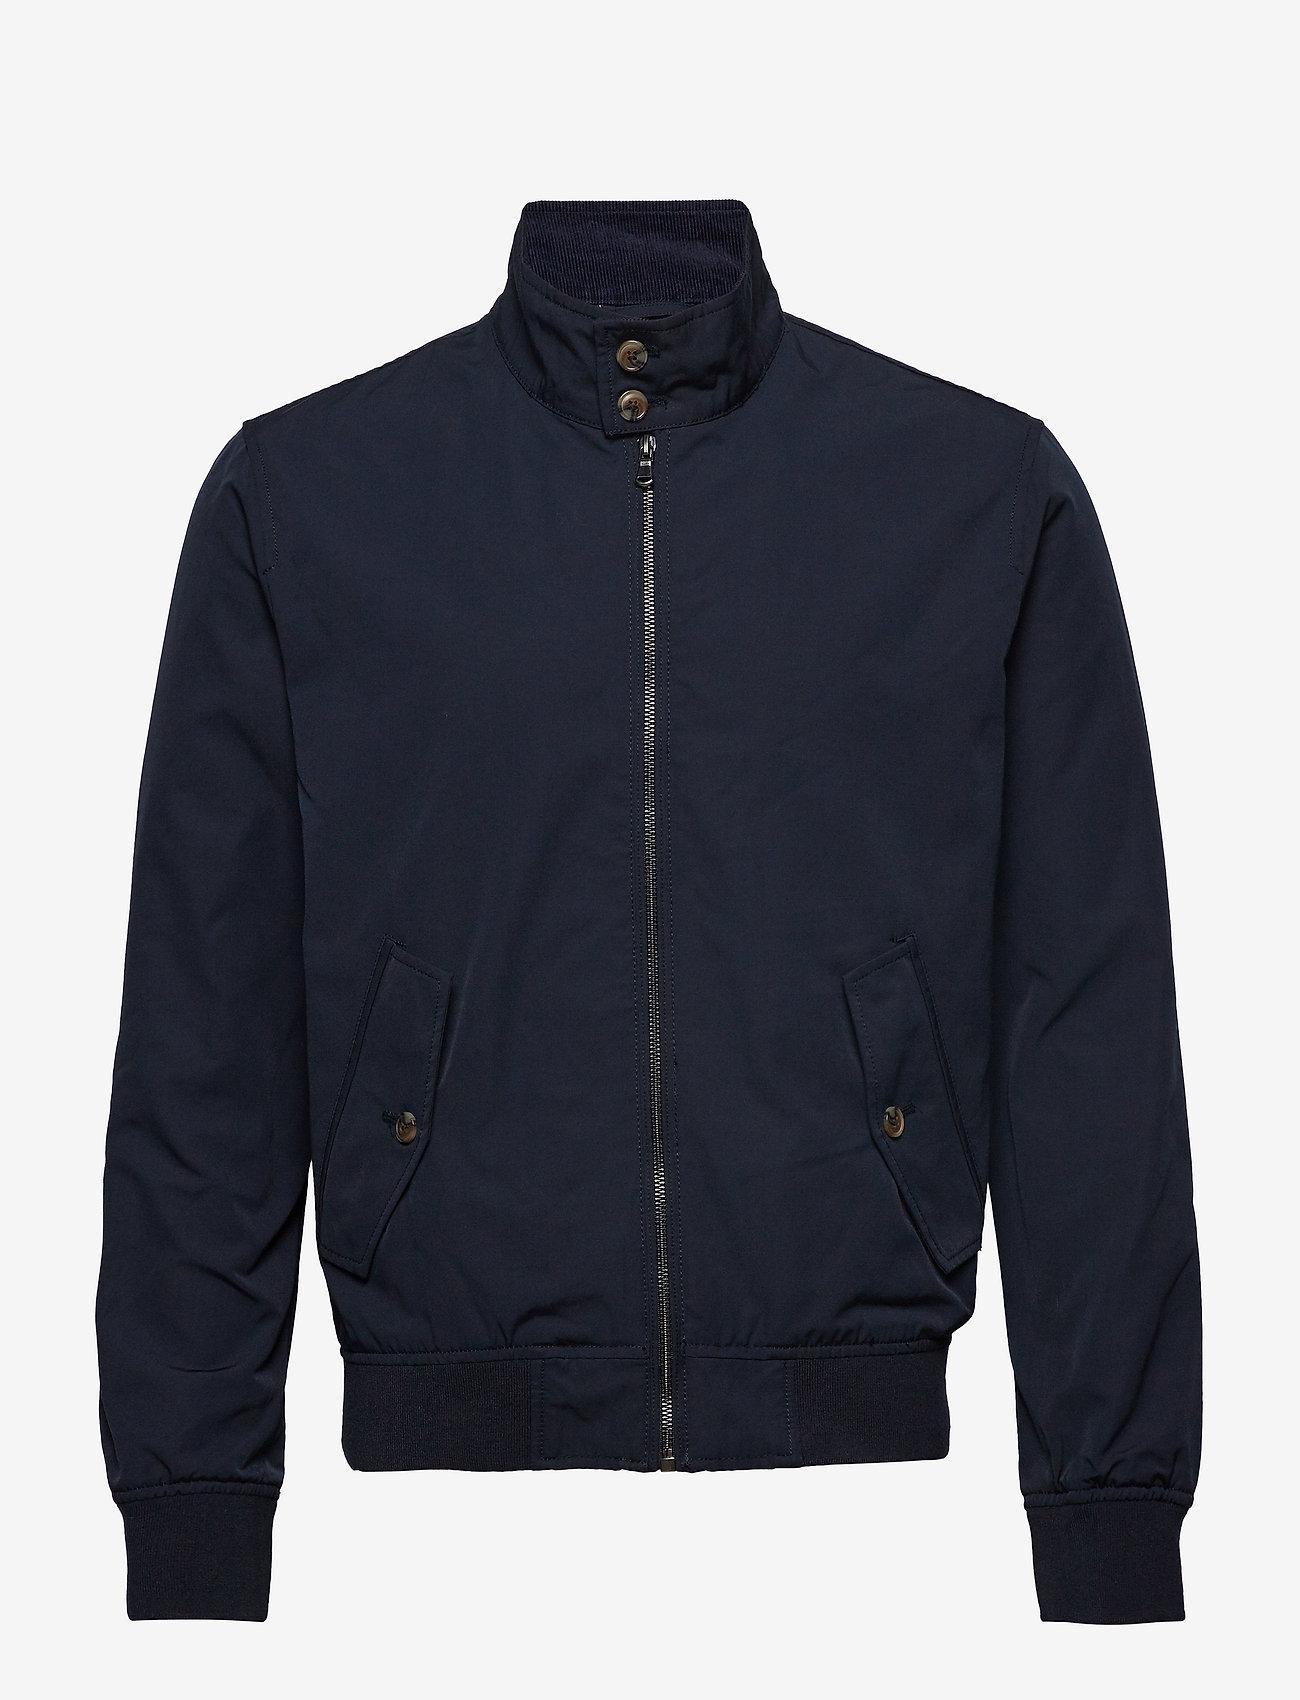 Esprit Casual Jackets Outdoor Woven - Jackor & Rockar Dark Blue